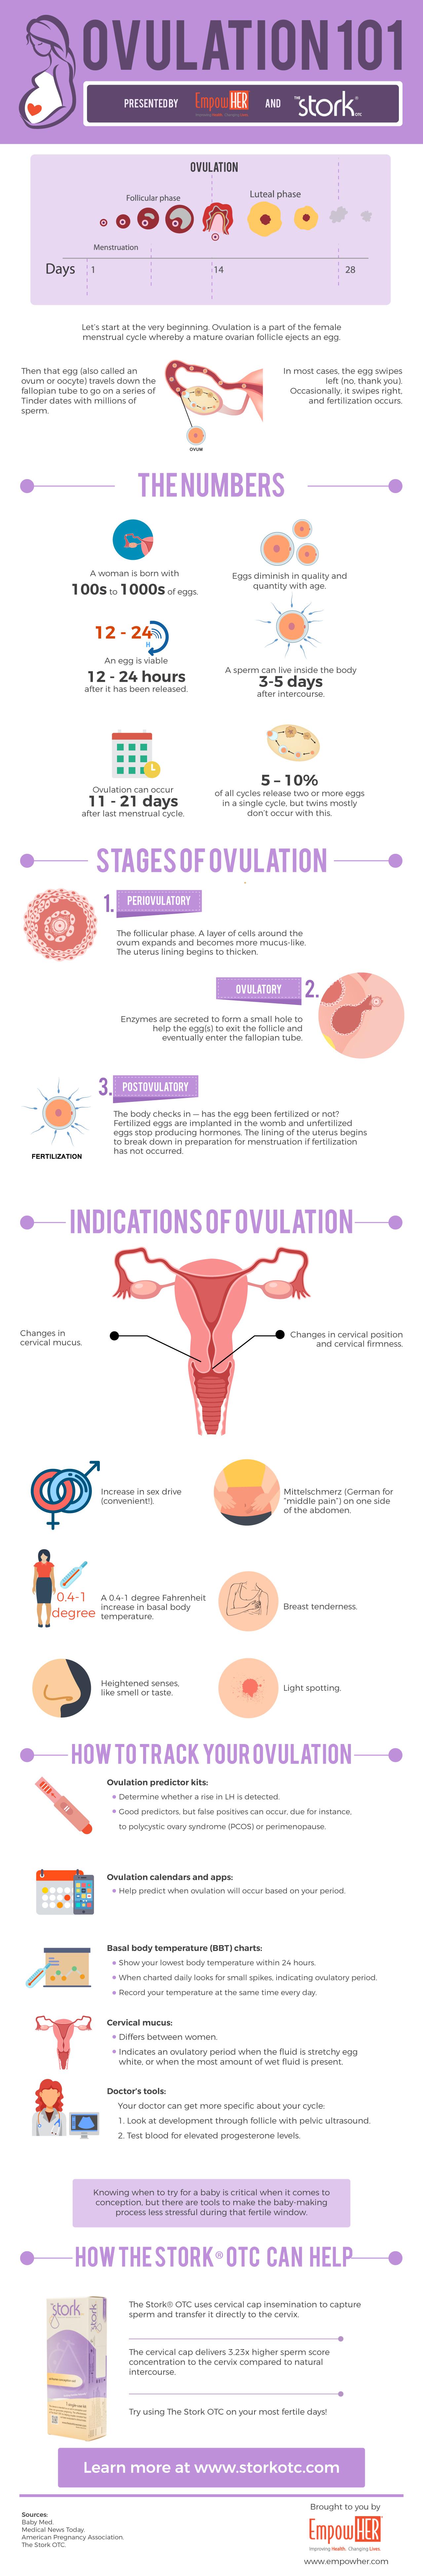 Infographic Ovulation 101